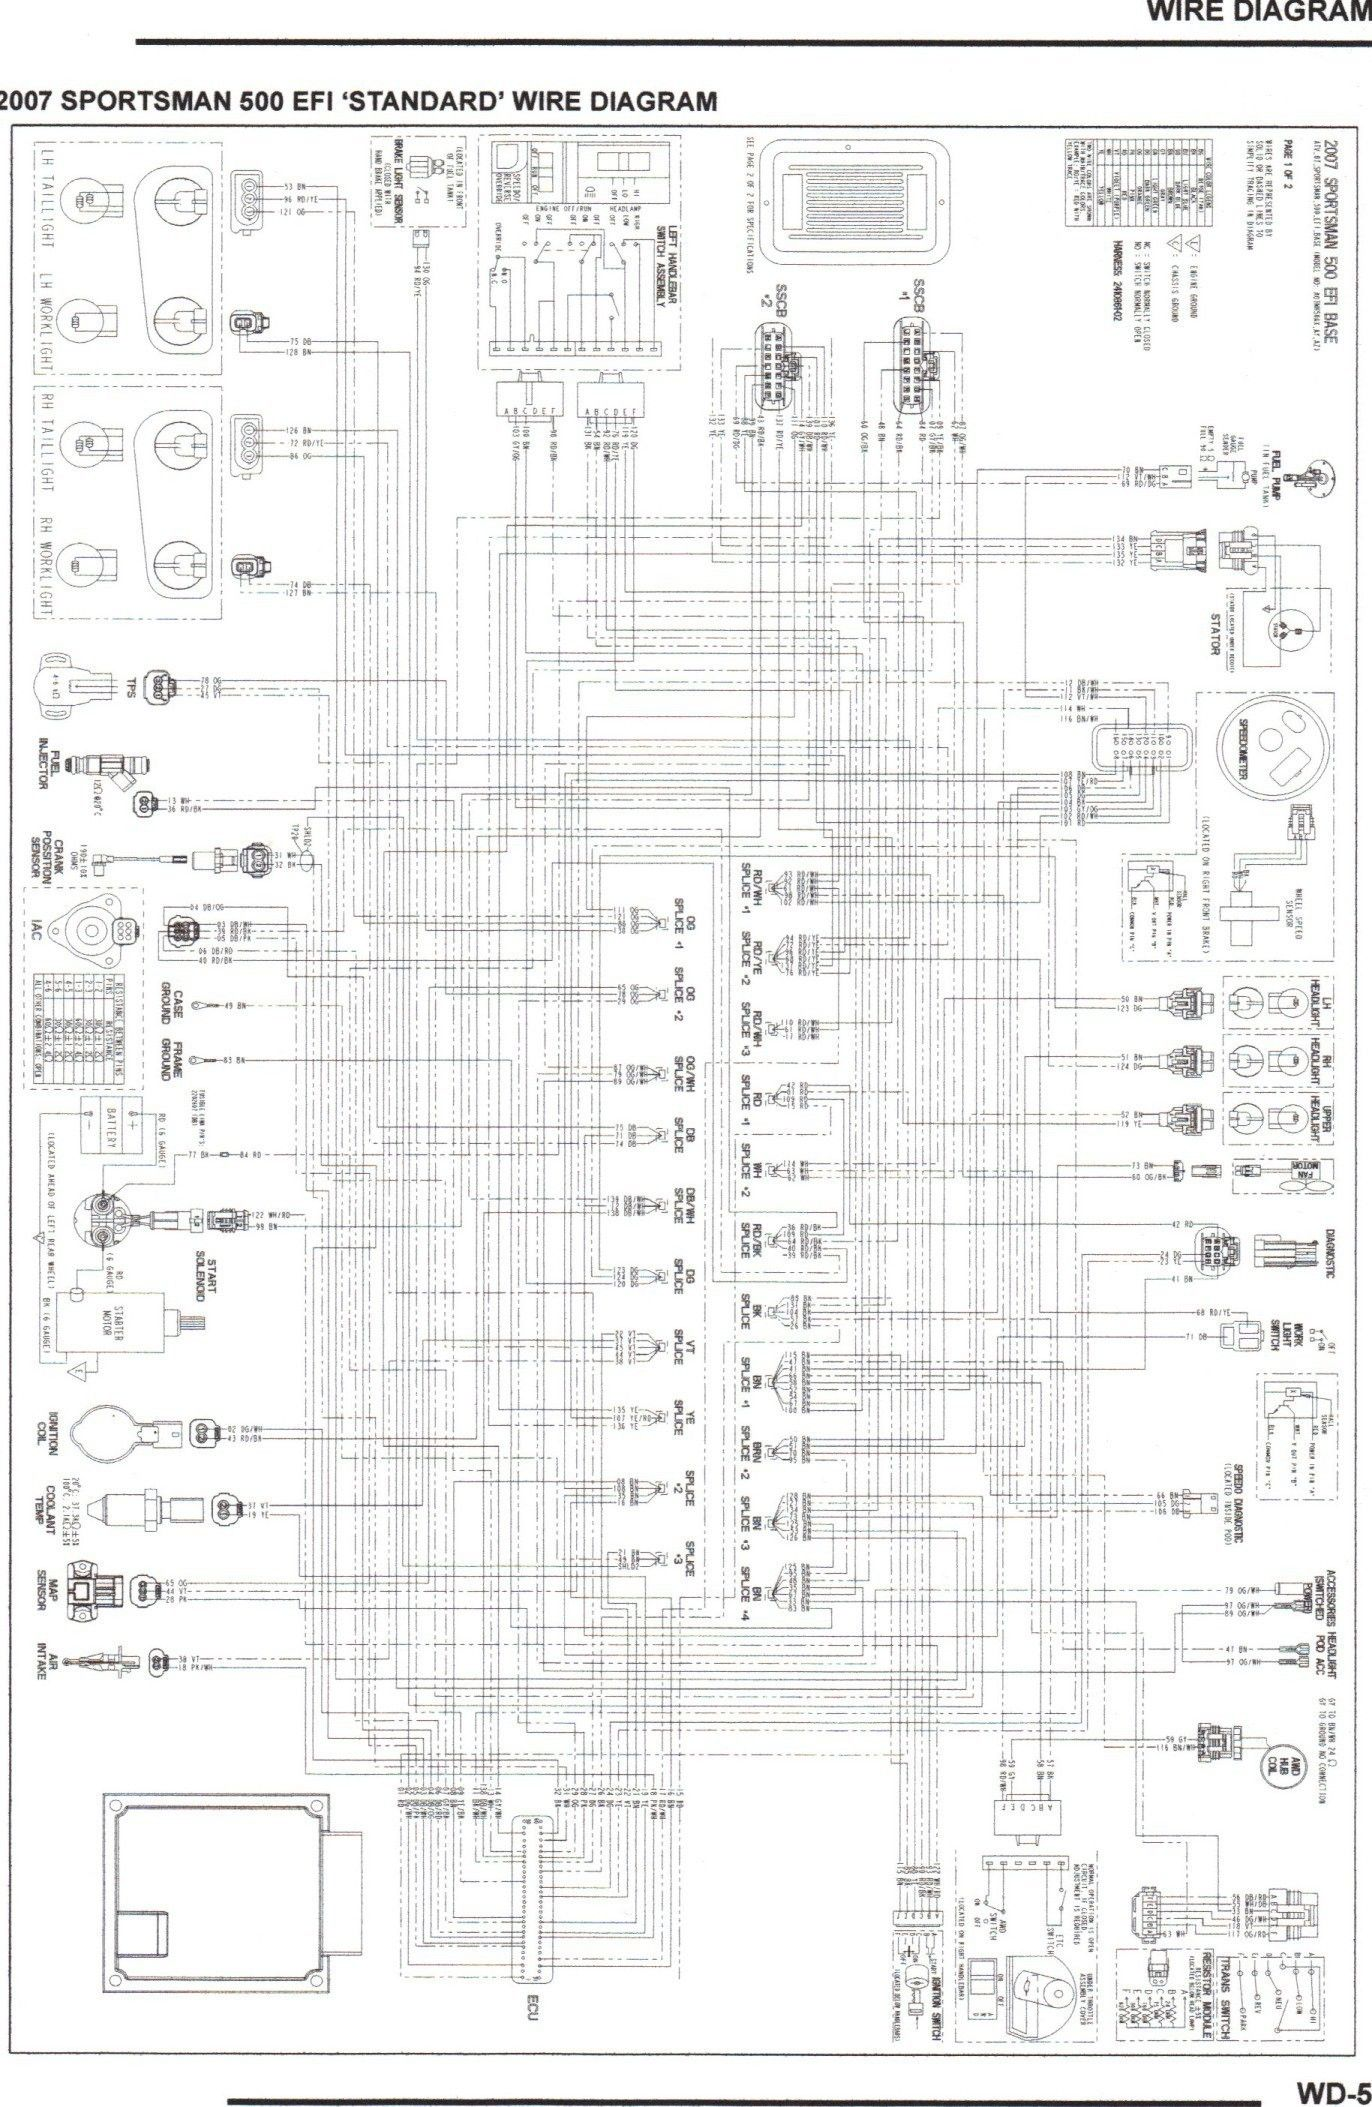 Wiring Diagram For 2009 Polaris Sportsman 500 Ho Circuit Wiring | Diagram,  Polaris ranger, Wire | Sportsman 500 Wiring Diagram |  | Pinterest